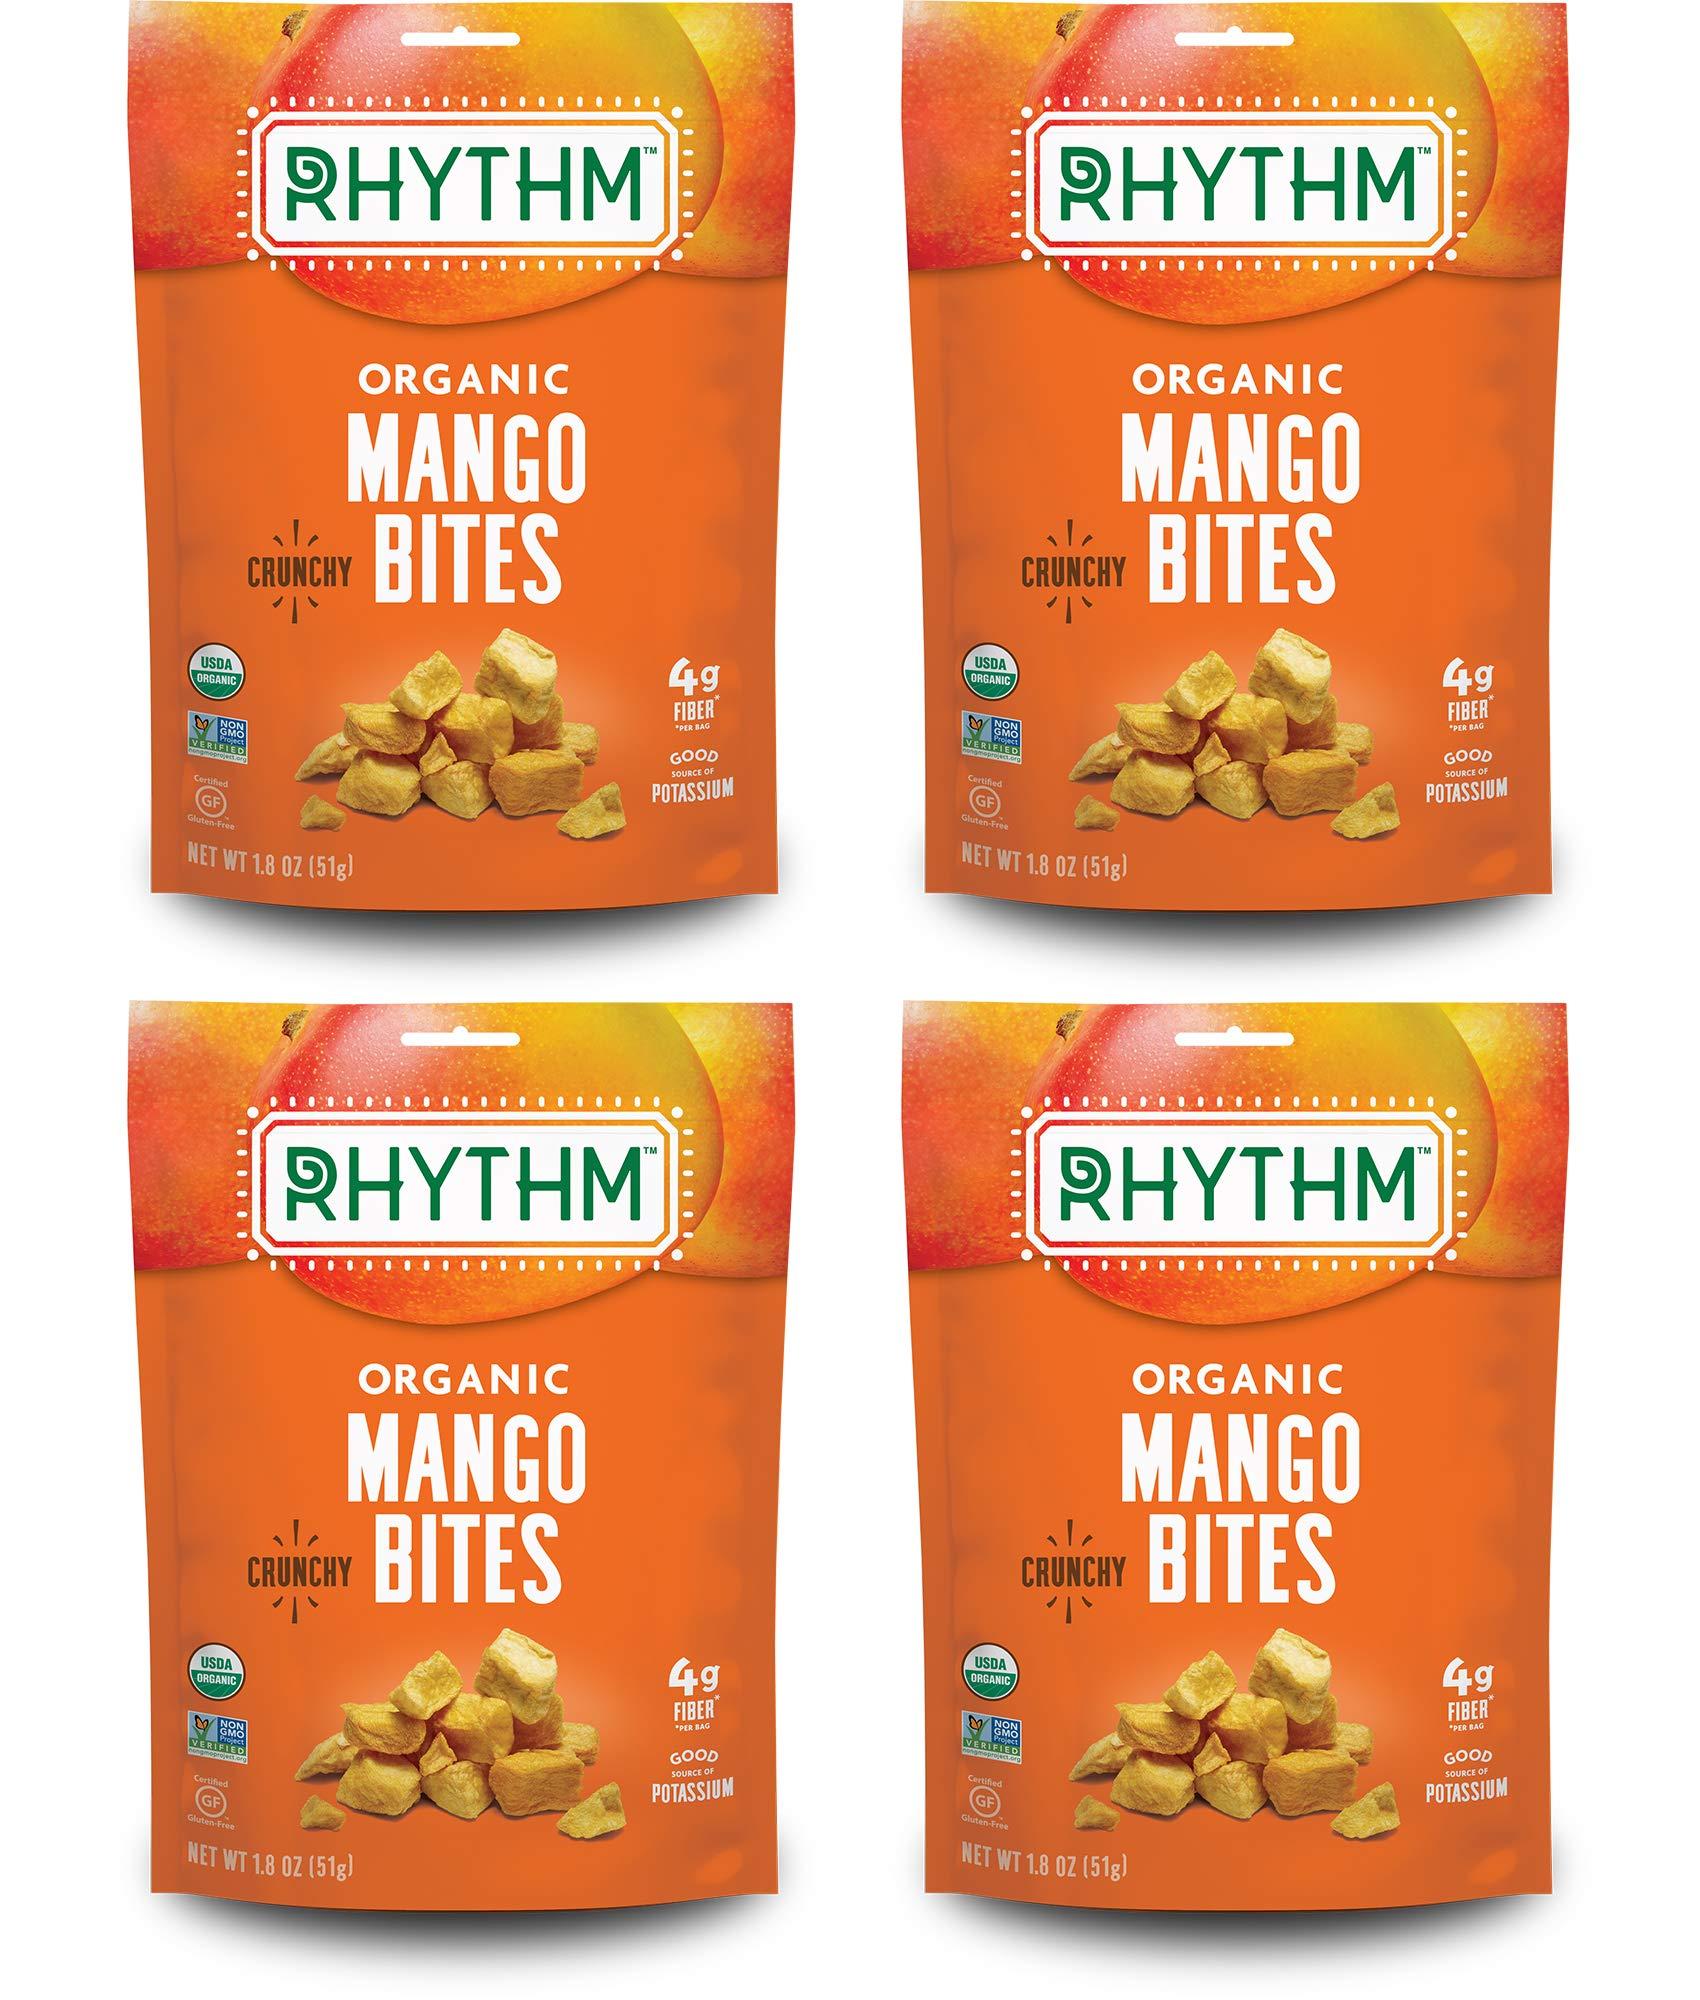 Rhythm Superfoods Crunchy Mango Bites, Organic & Non-GMO, 1.8 Oz (Pack Of 4), Vegan/Gluten-Free Dehydrated Sweet Fruit Snacks